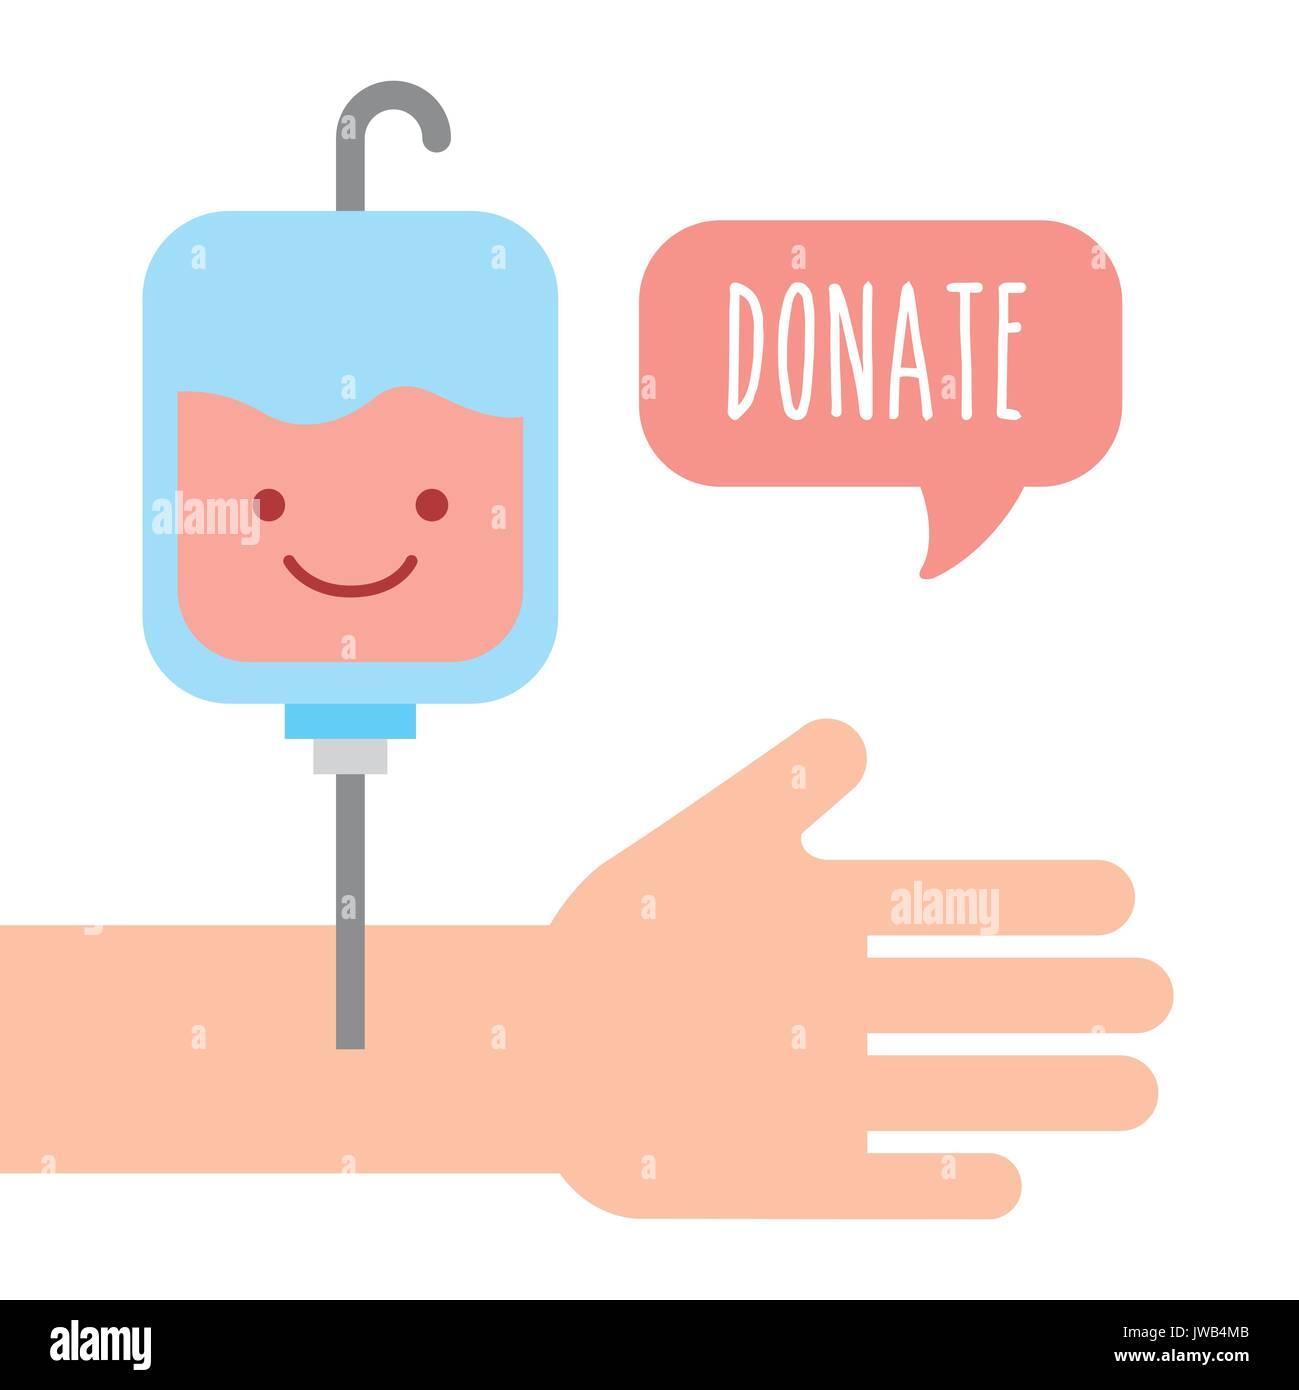 donate children money - Stock Image